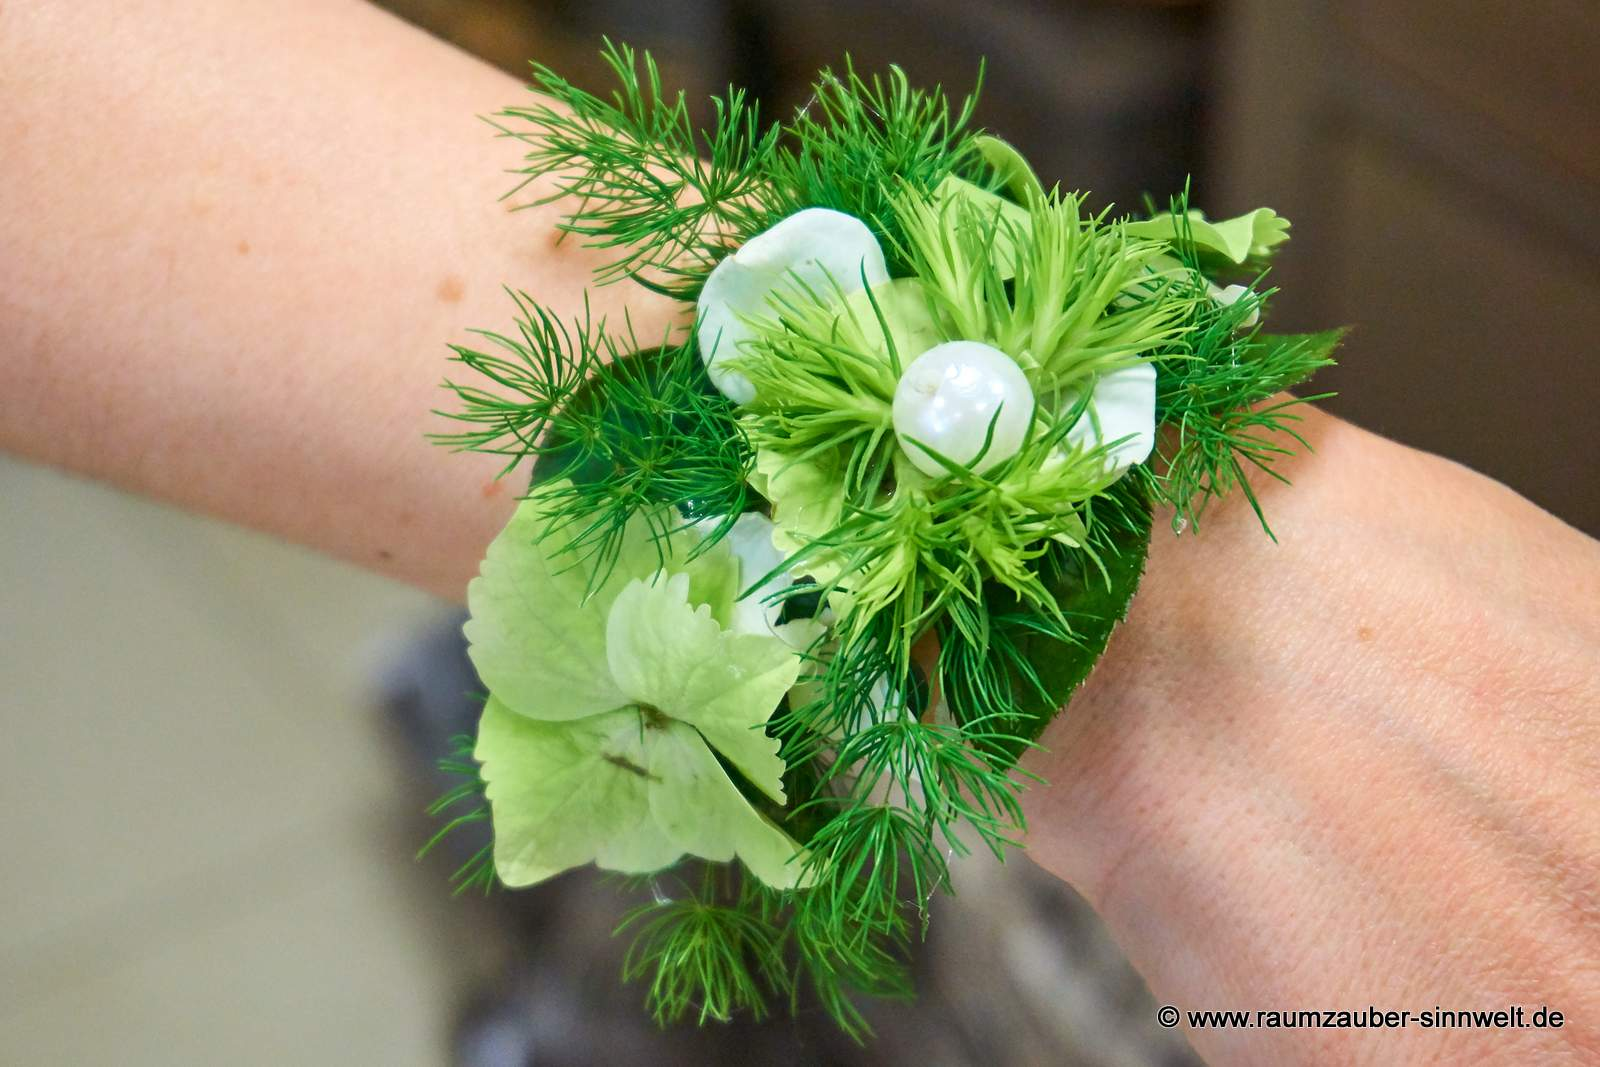 Armband mit Hortensienblüten